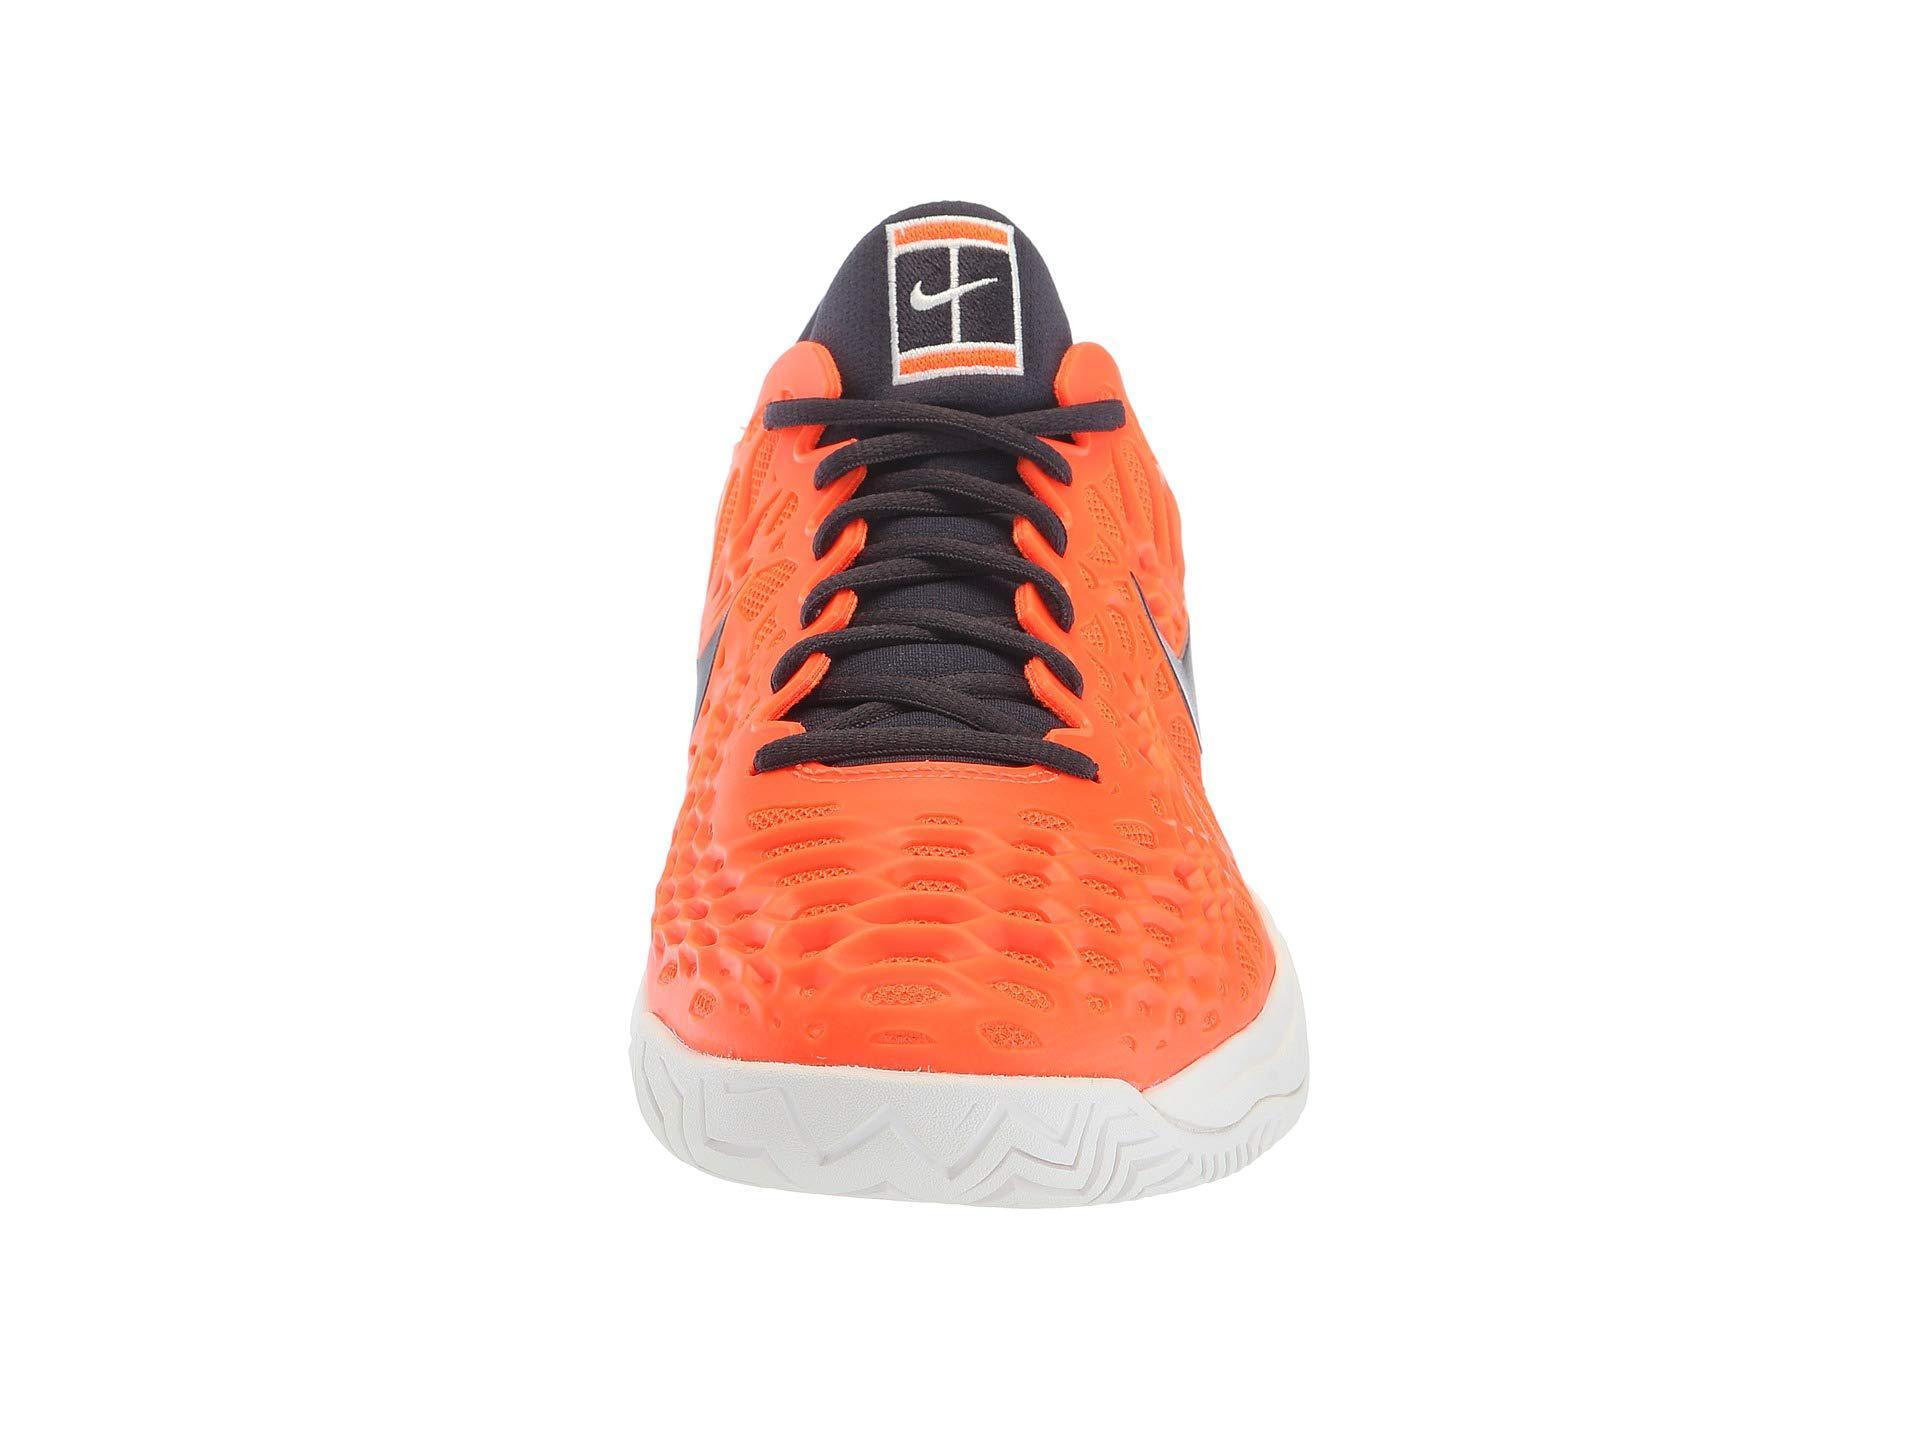 67f8bc59 In Nike Men Clay Cage 3 Lyst Tennis Zoom Shoe Orange For rwYUqr